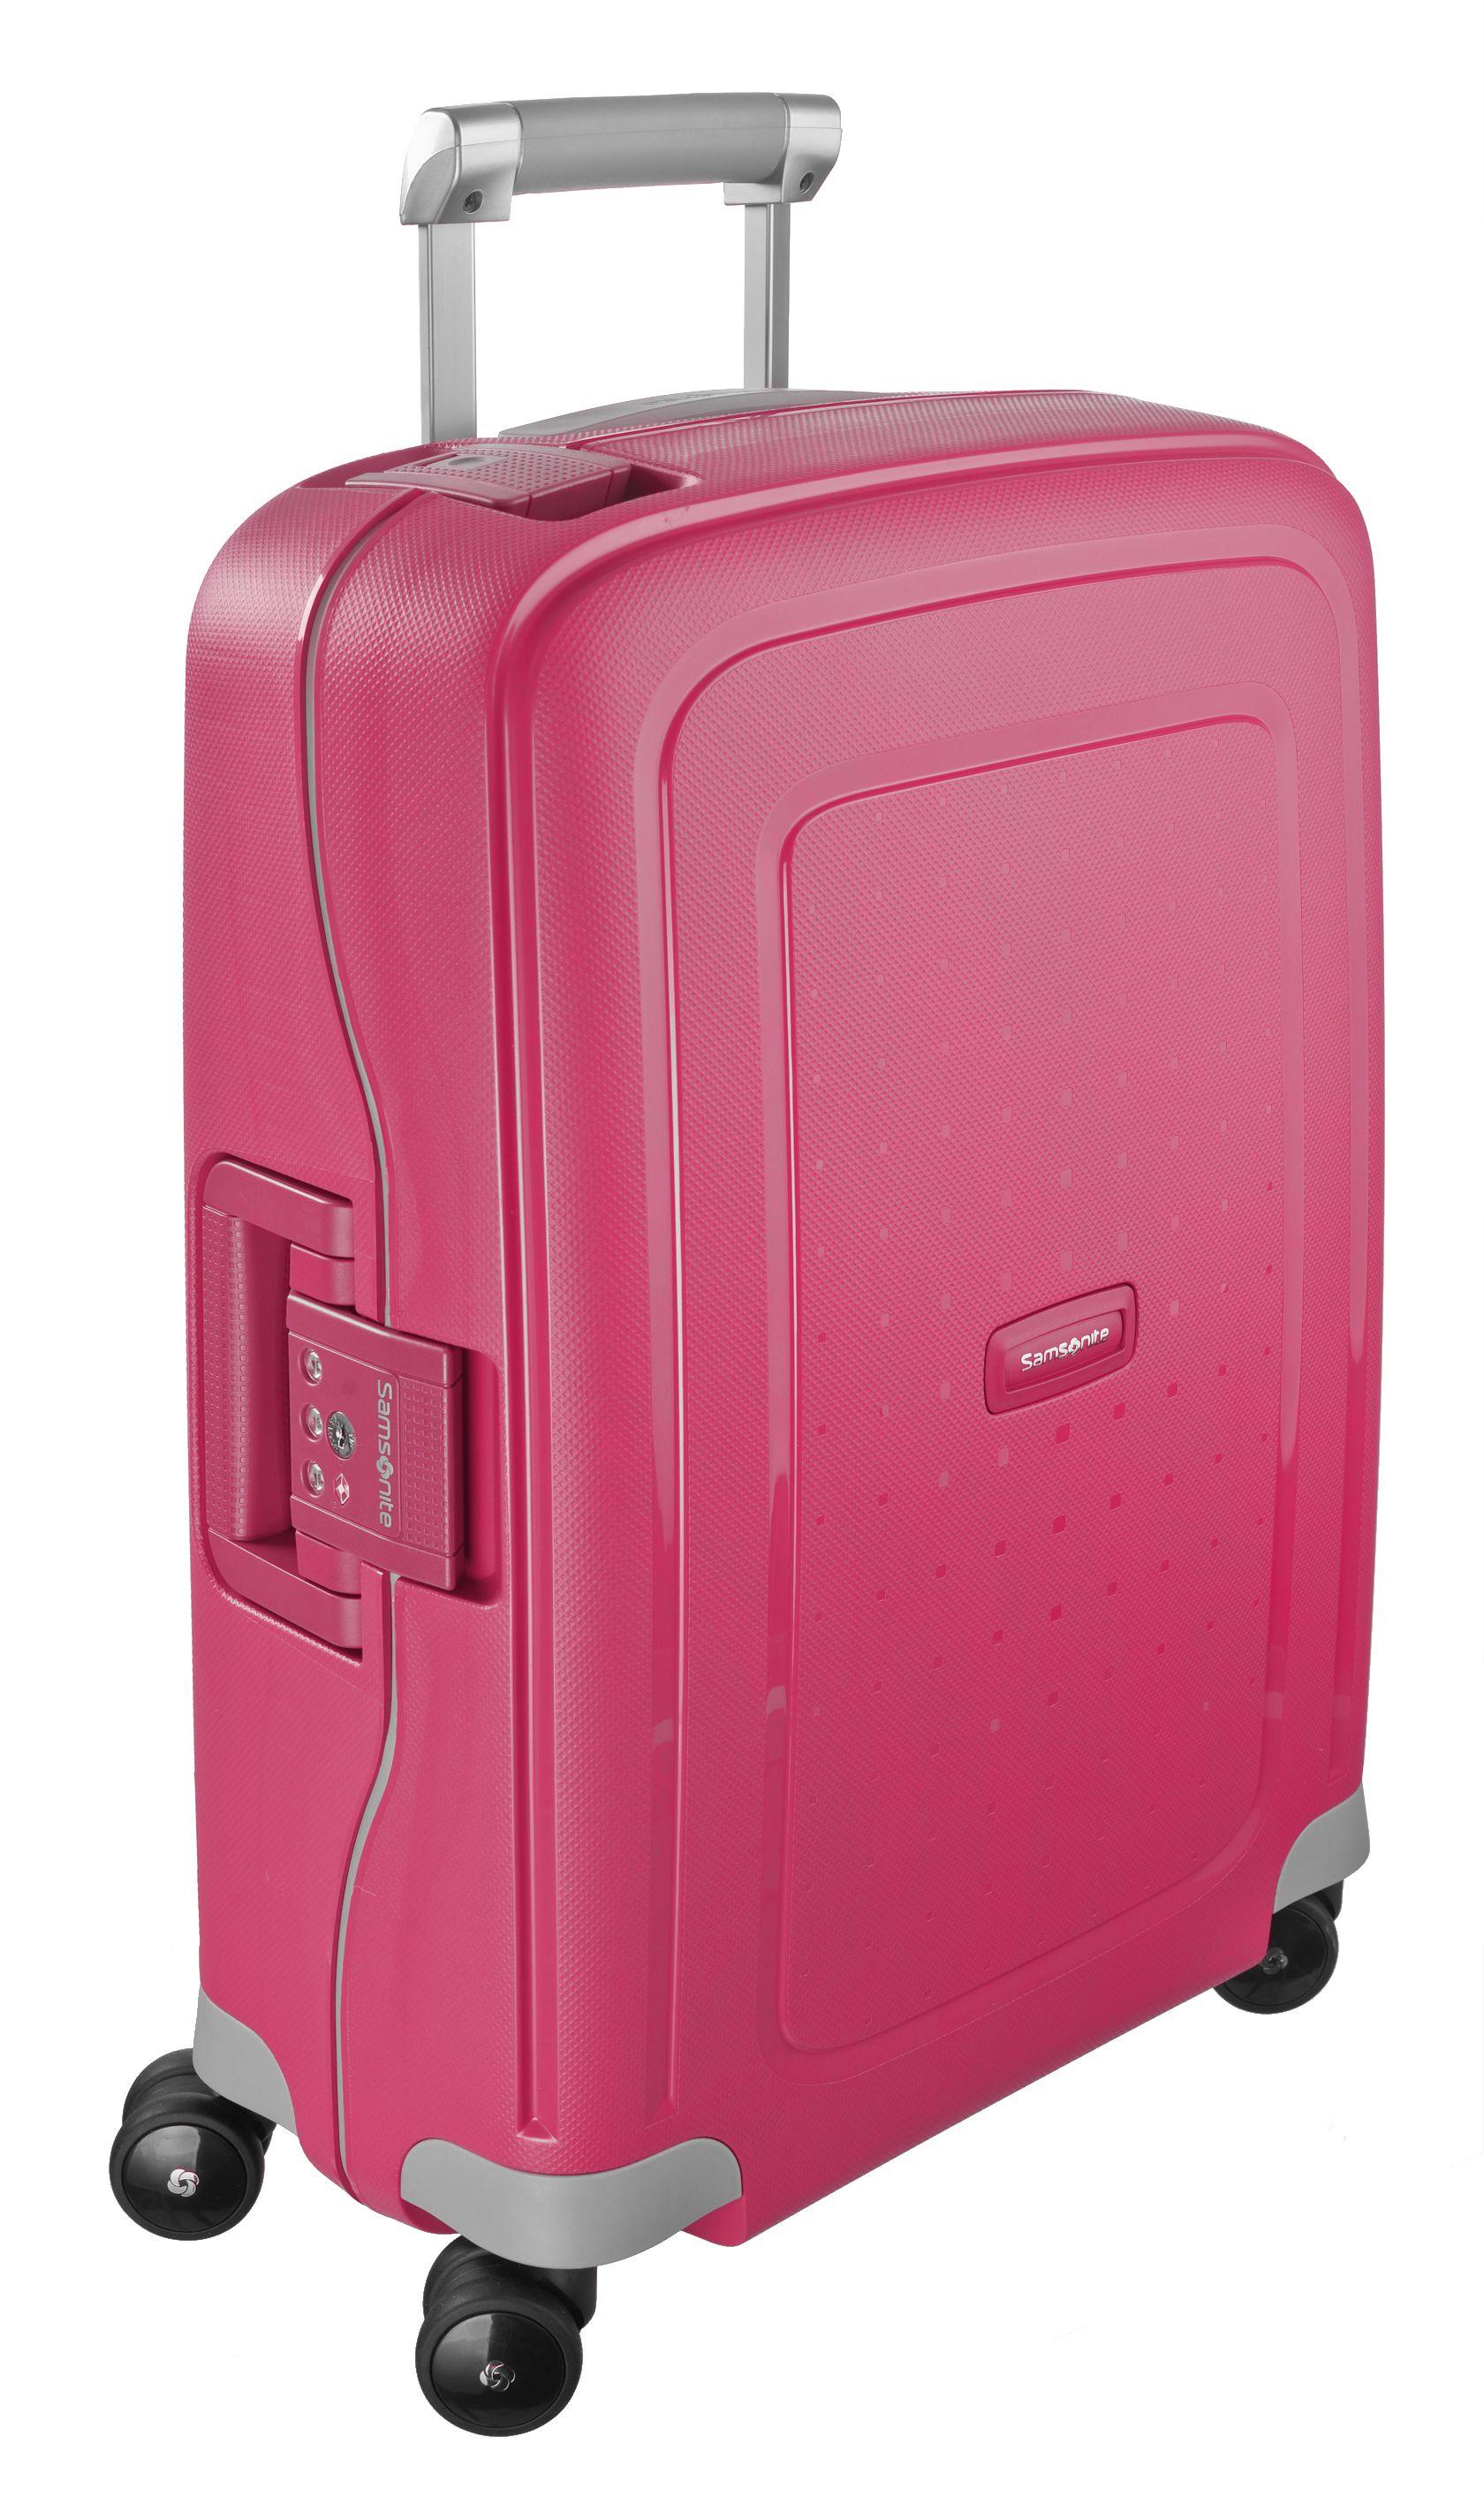 S'Cure Bright Pink 69cm #Samsonite #SCure #Travel #Suitcase ...